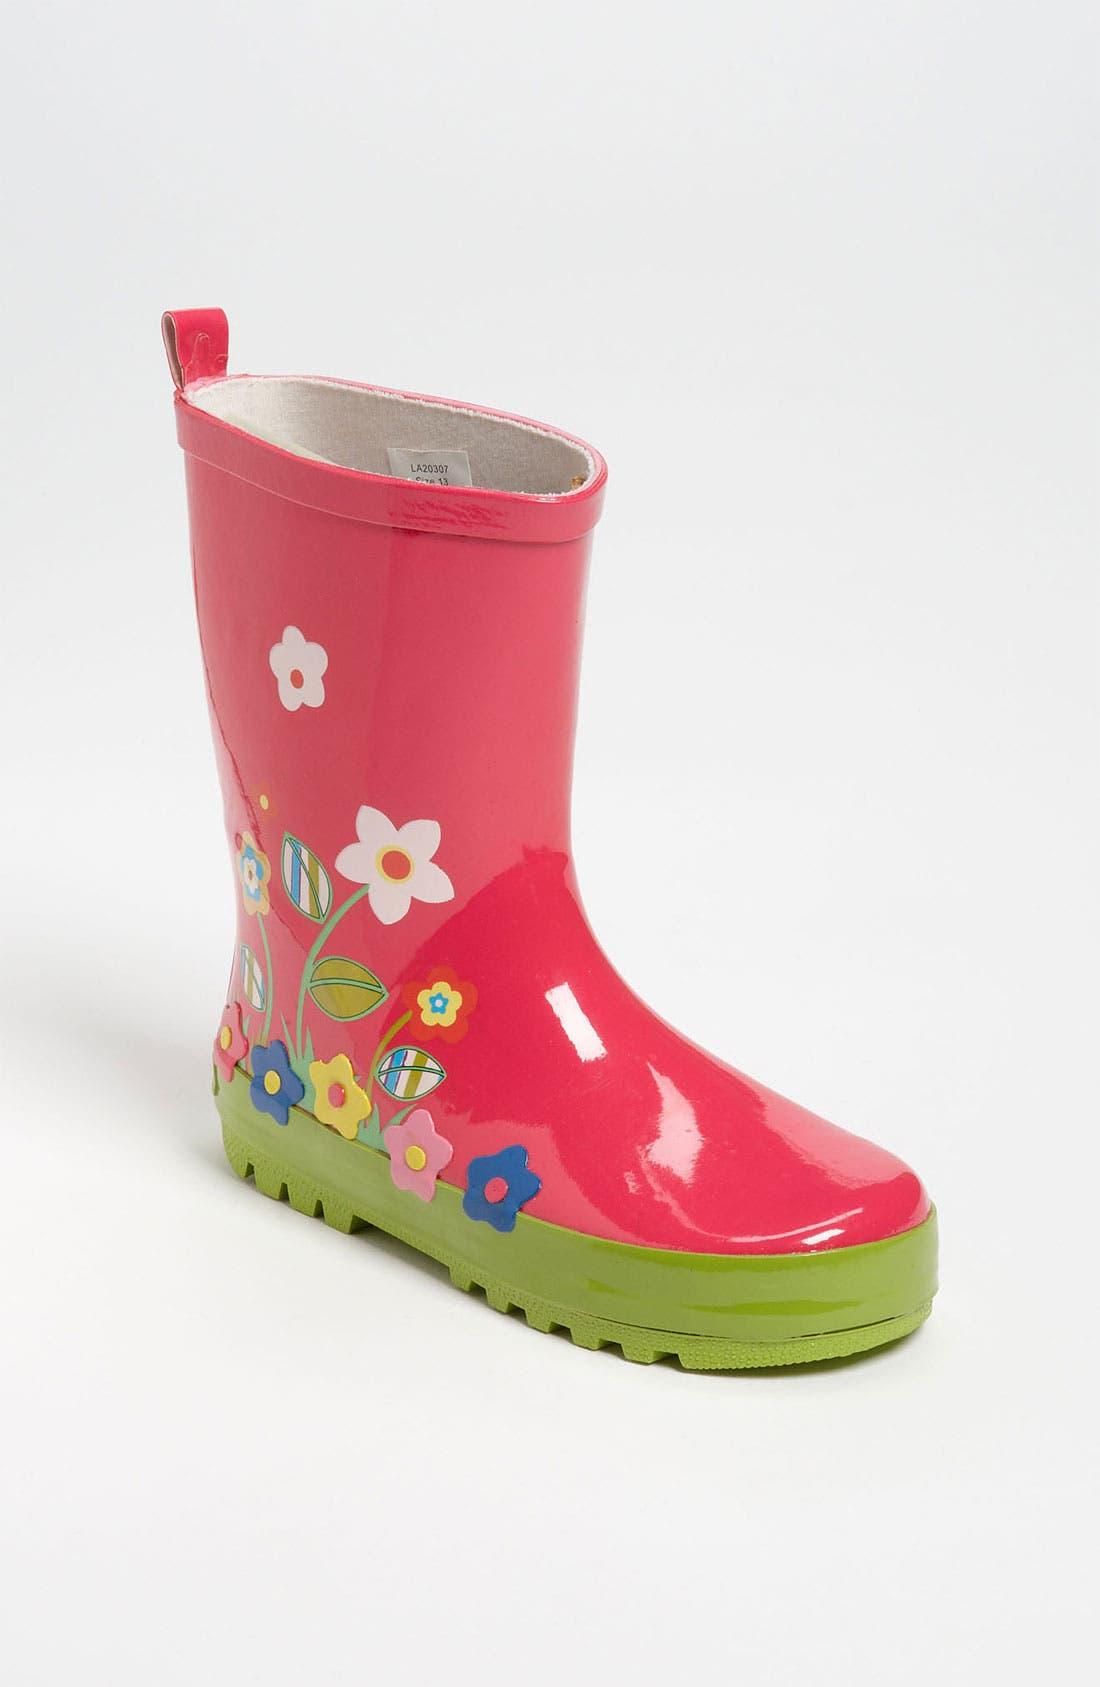 Main Image - Laura Ashley 'Garden' Rain Boot (Walker, Toddler, Little Kid & Big Kid)